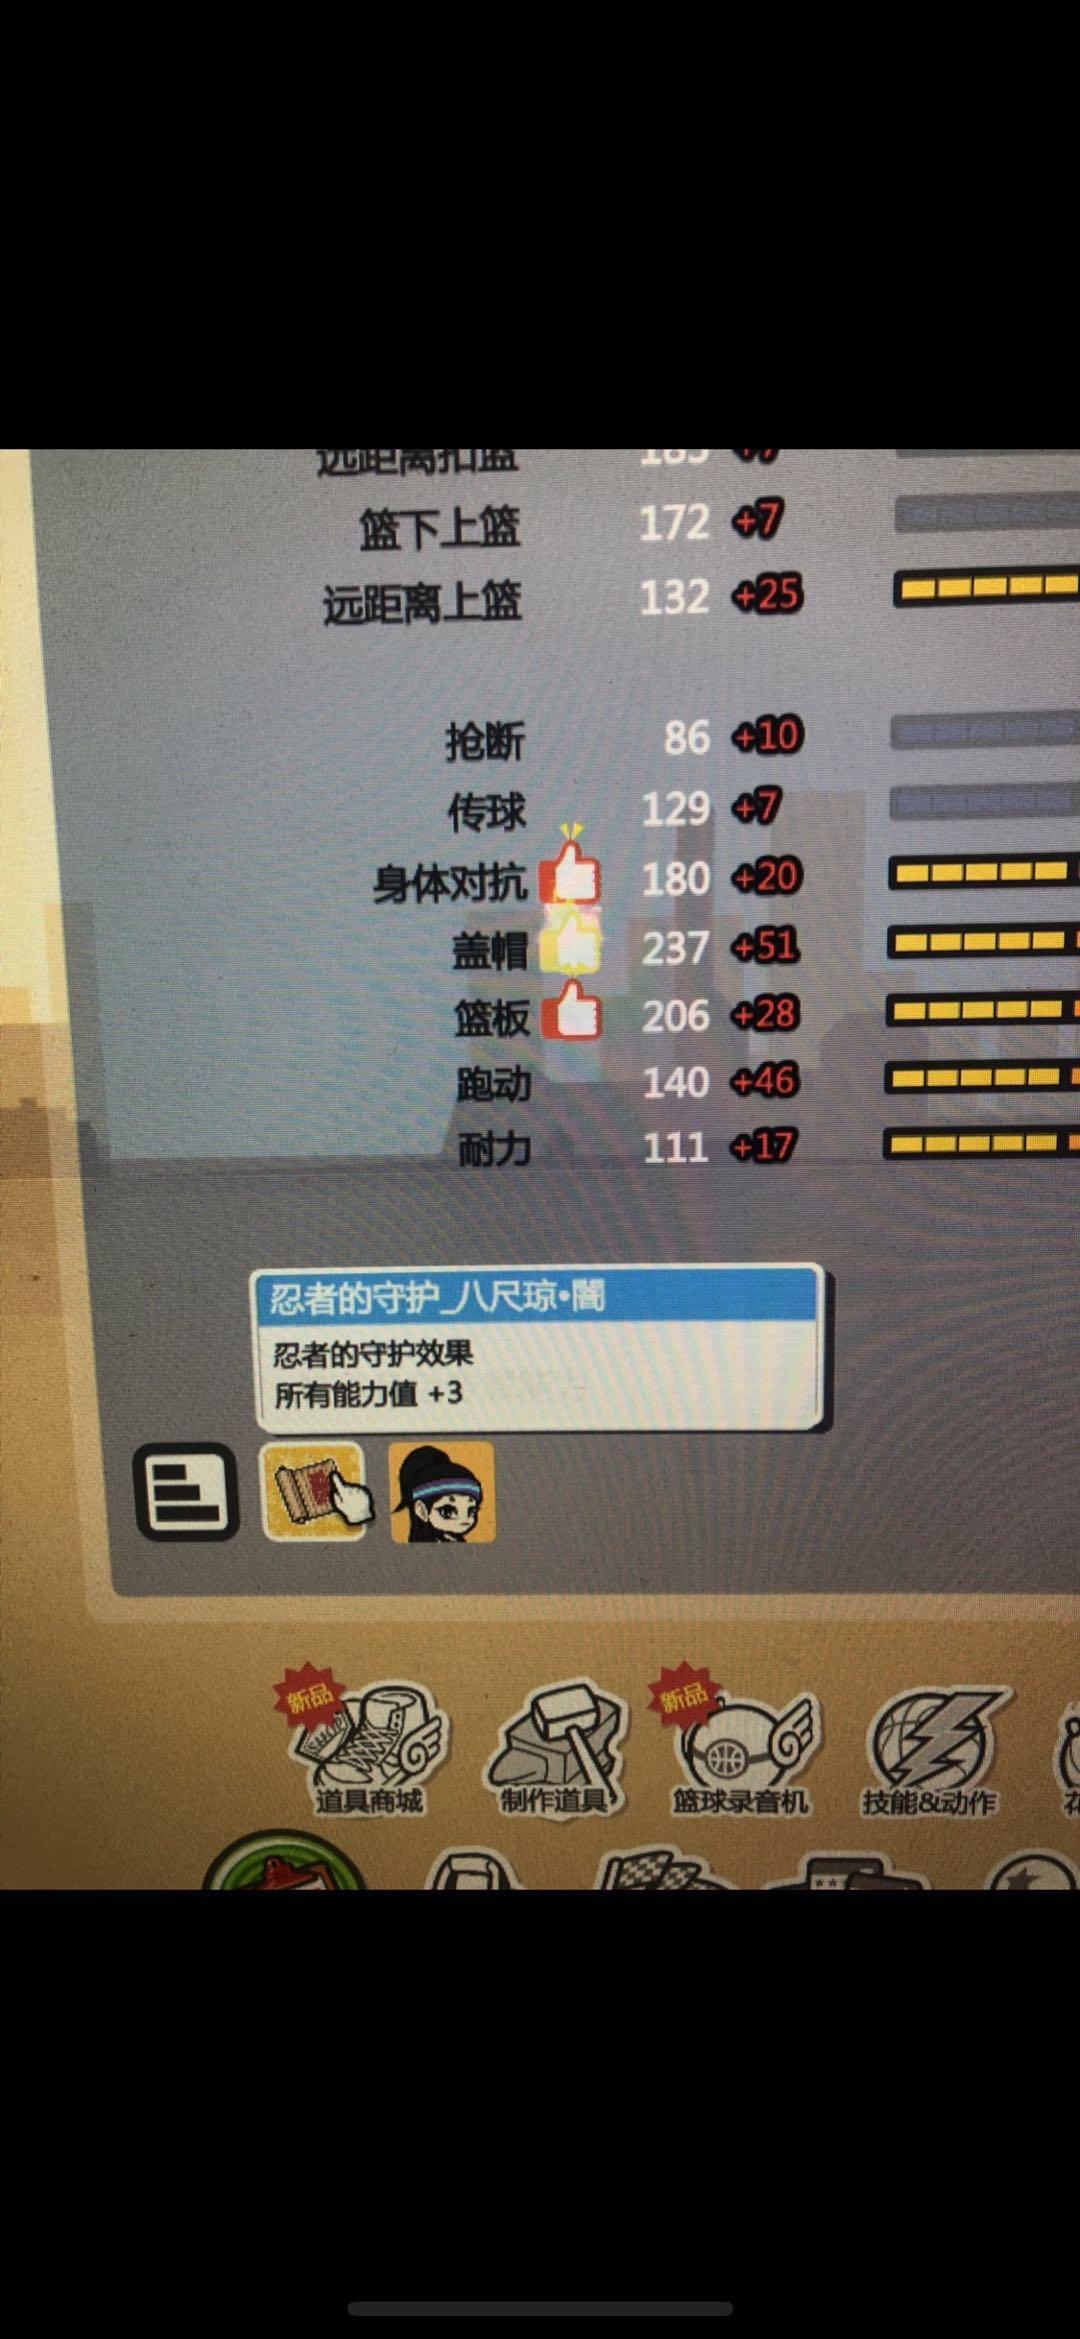 6DBC9DC6-F895-4A4B-B1C7-4101D9E4C000.jpeg